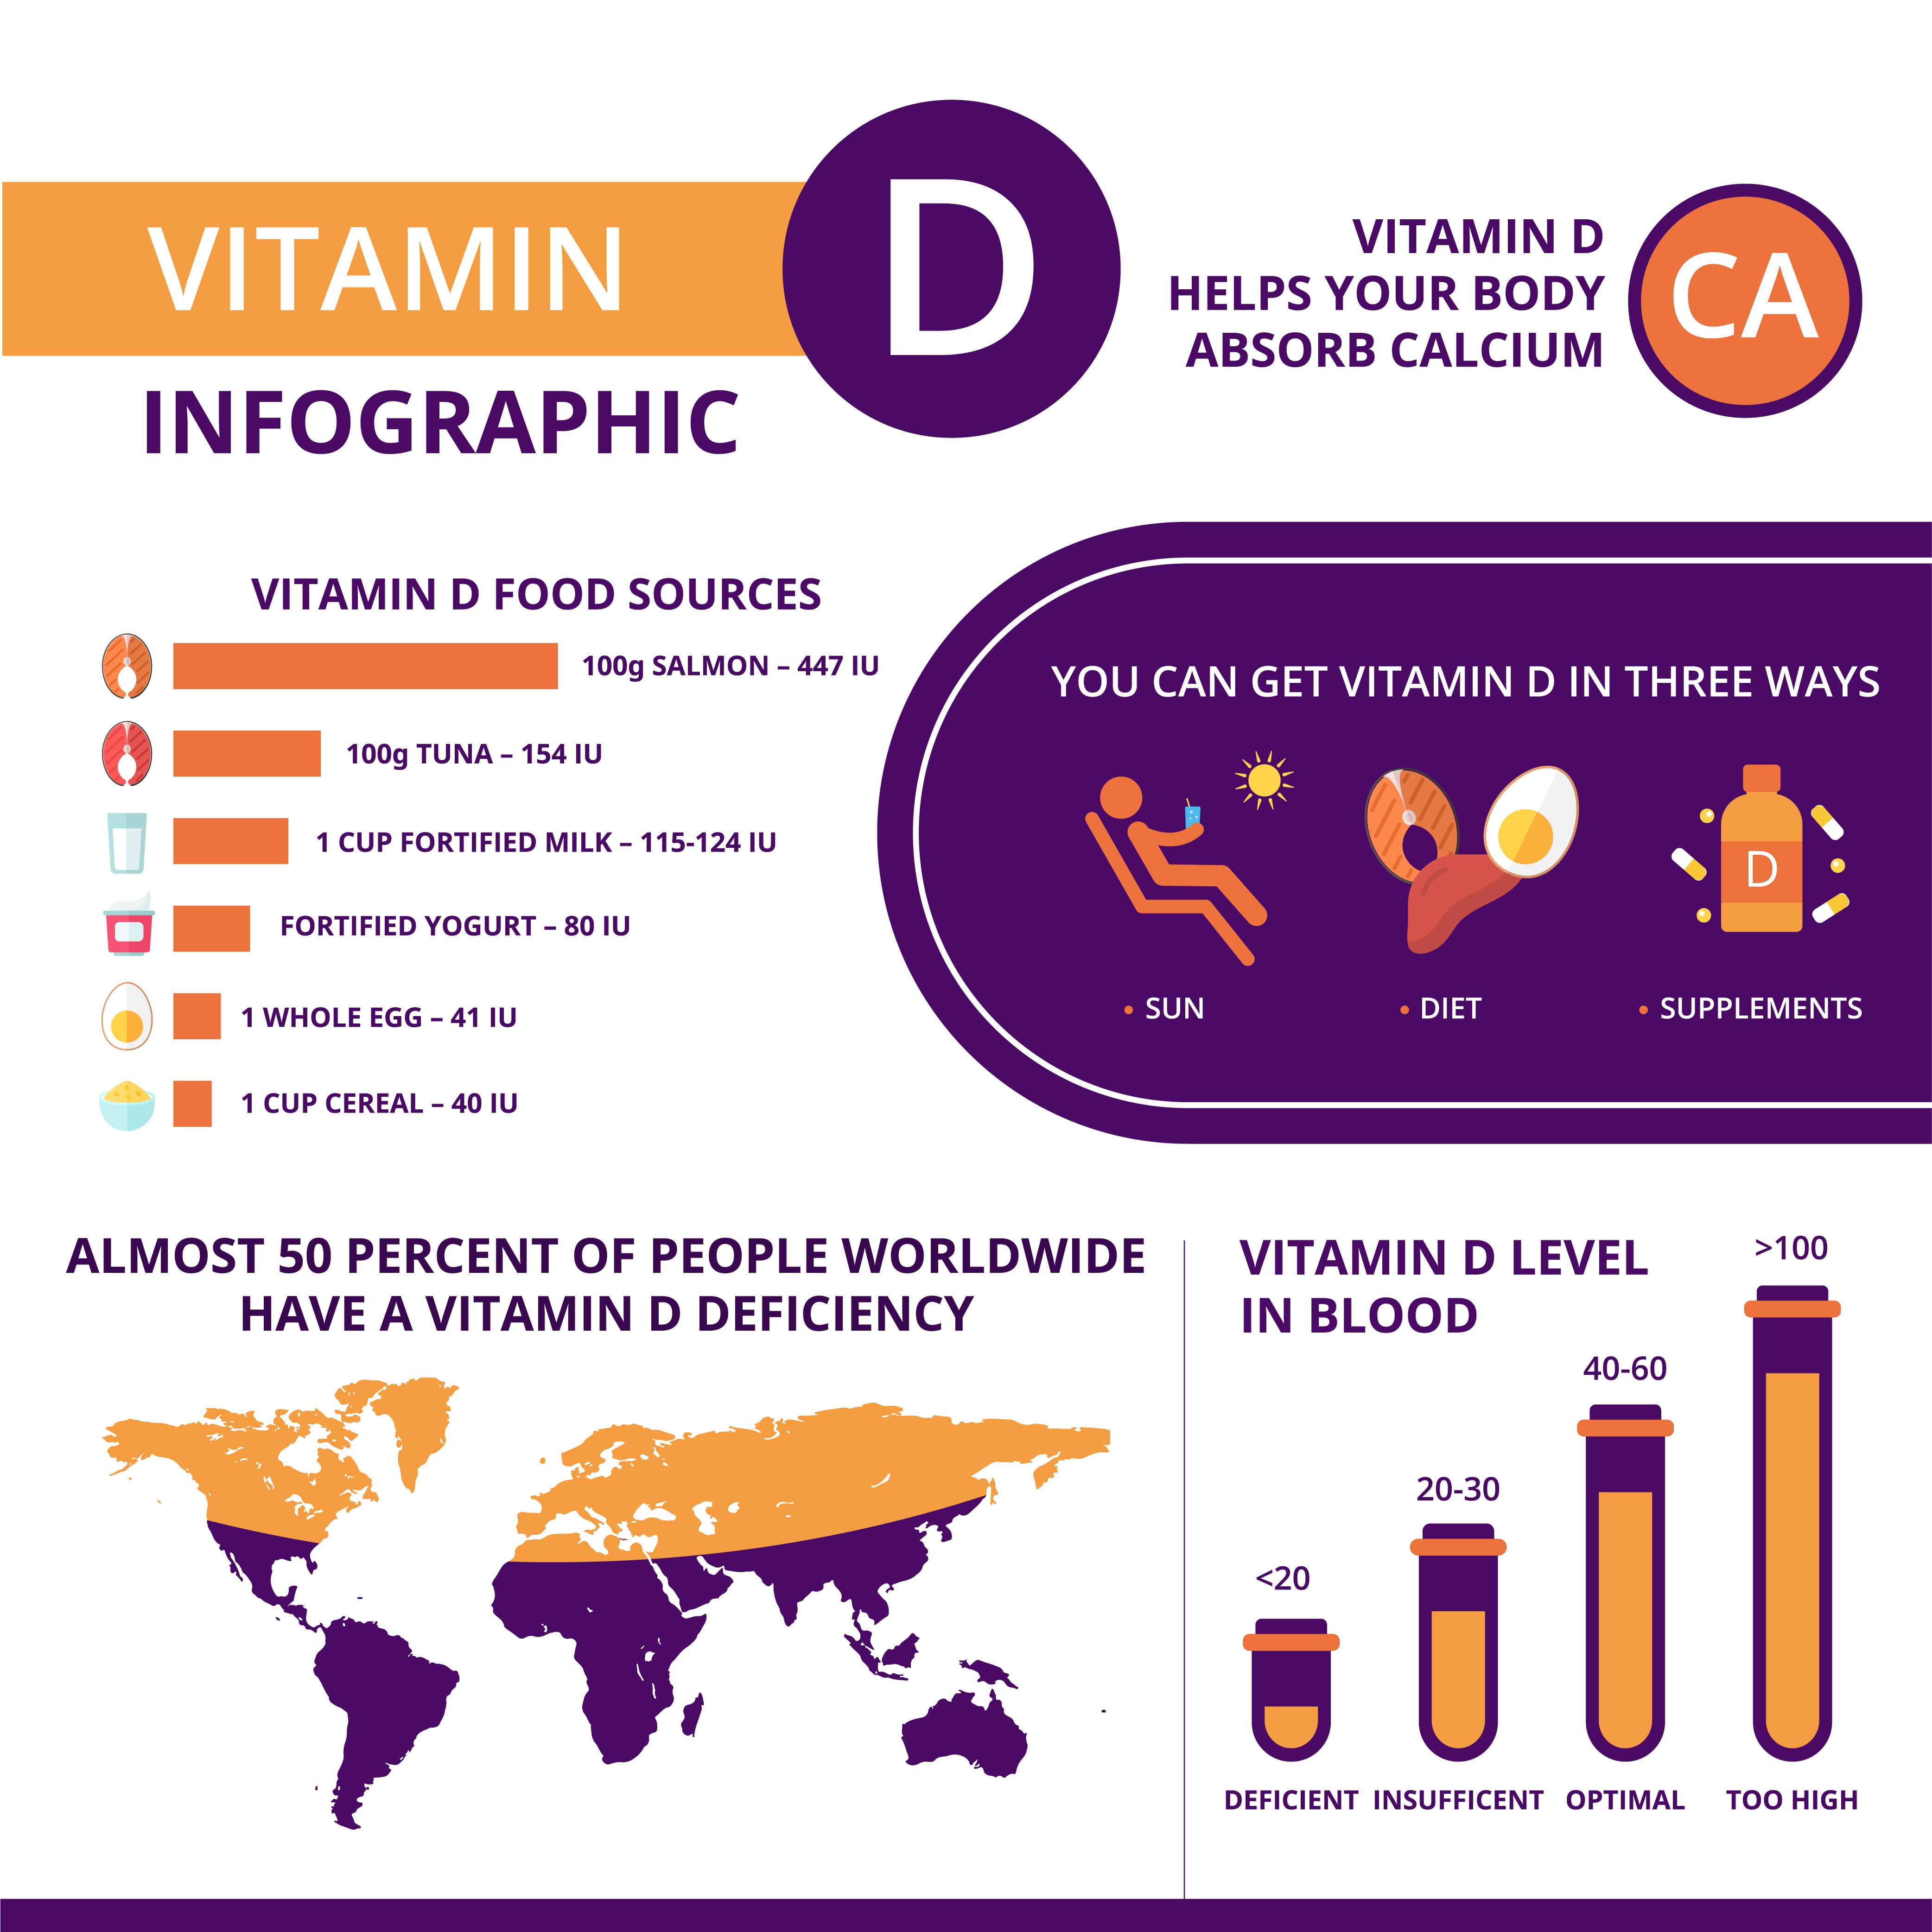 Vitamin D basic information - infographic